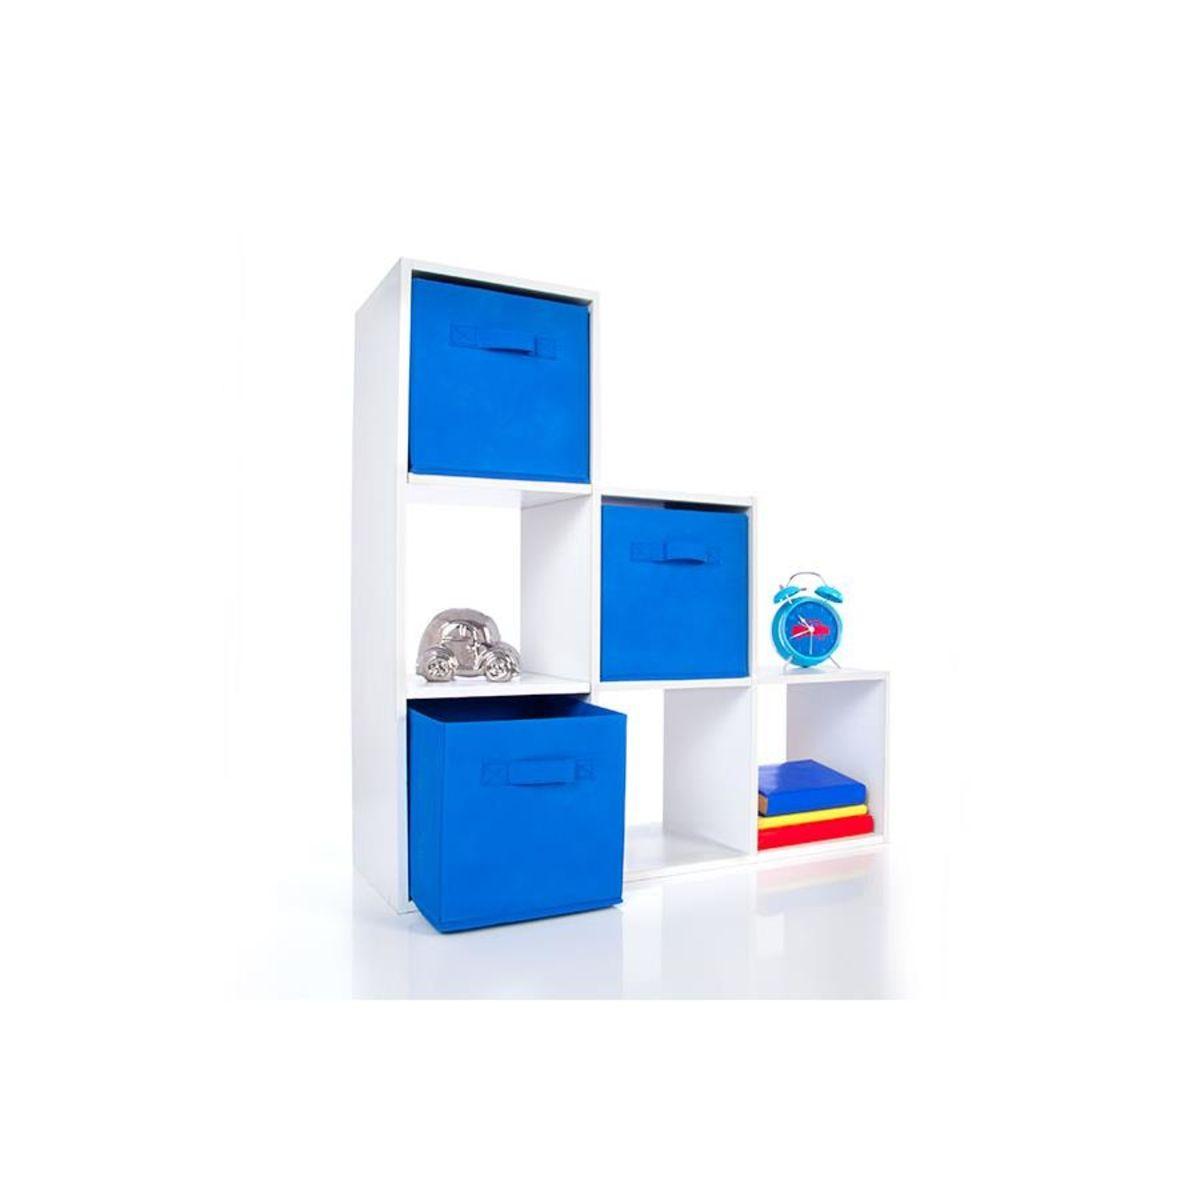 Childrenu0027s 6 Cube Storage Unit | Kmart  sc 1 st  Pinterest & Childrenu0027s 6 Cube Storage Unit | Kmart | Kidu0027s Room | Pinterest ...